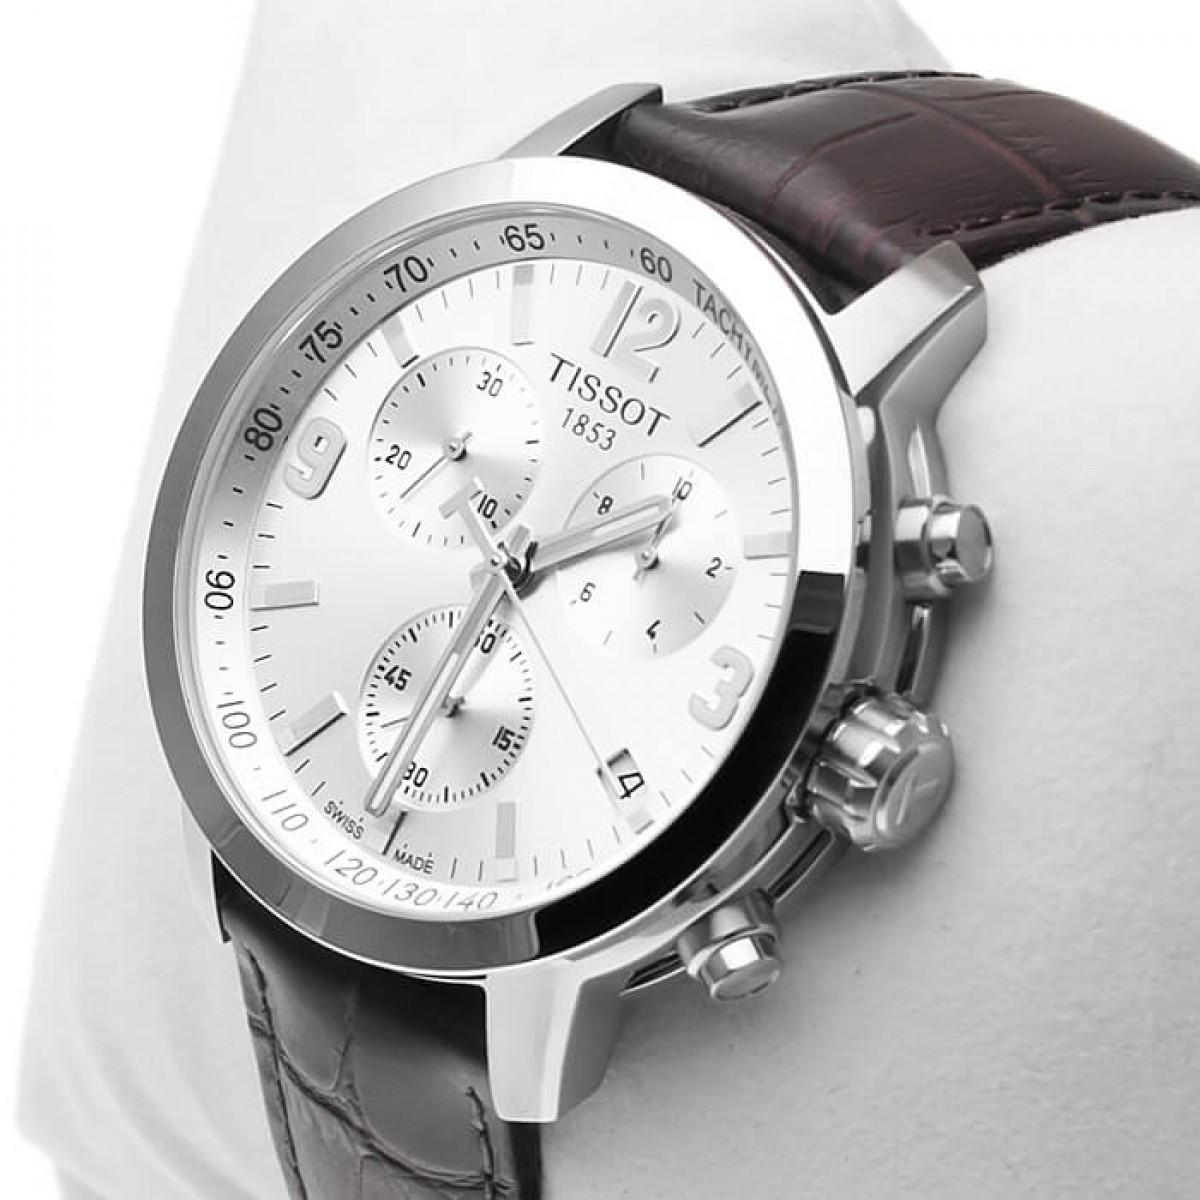 Часовник Tissot T049.417.16.037.00